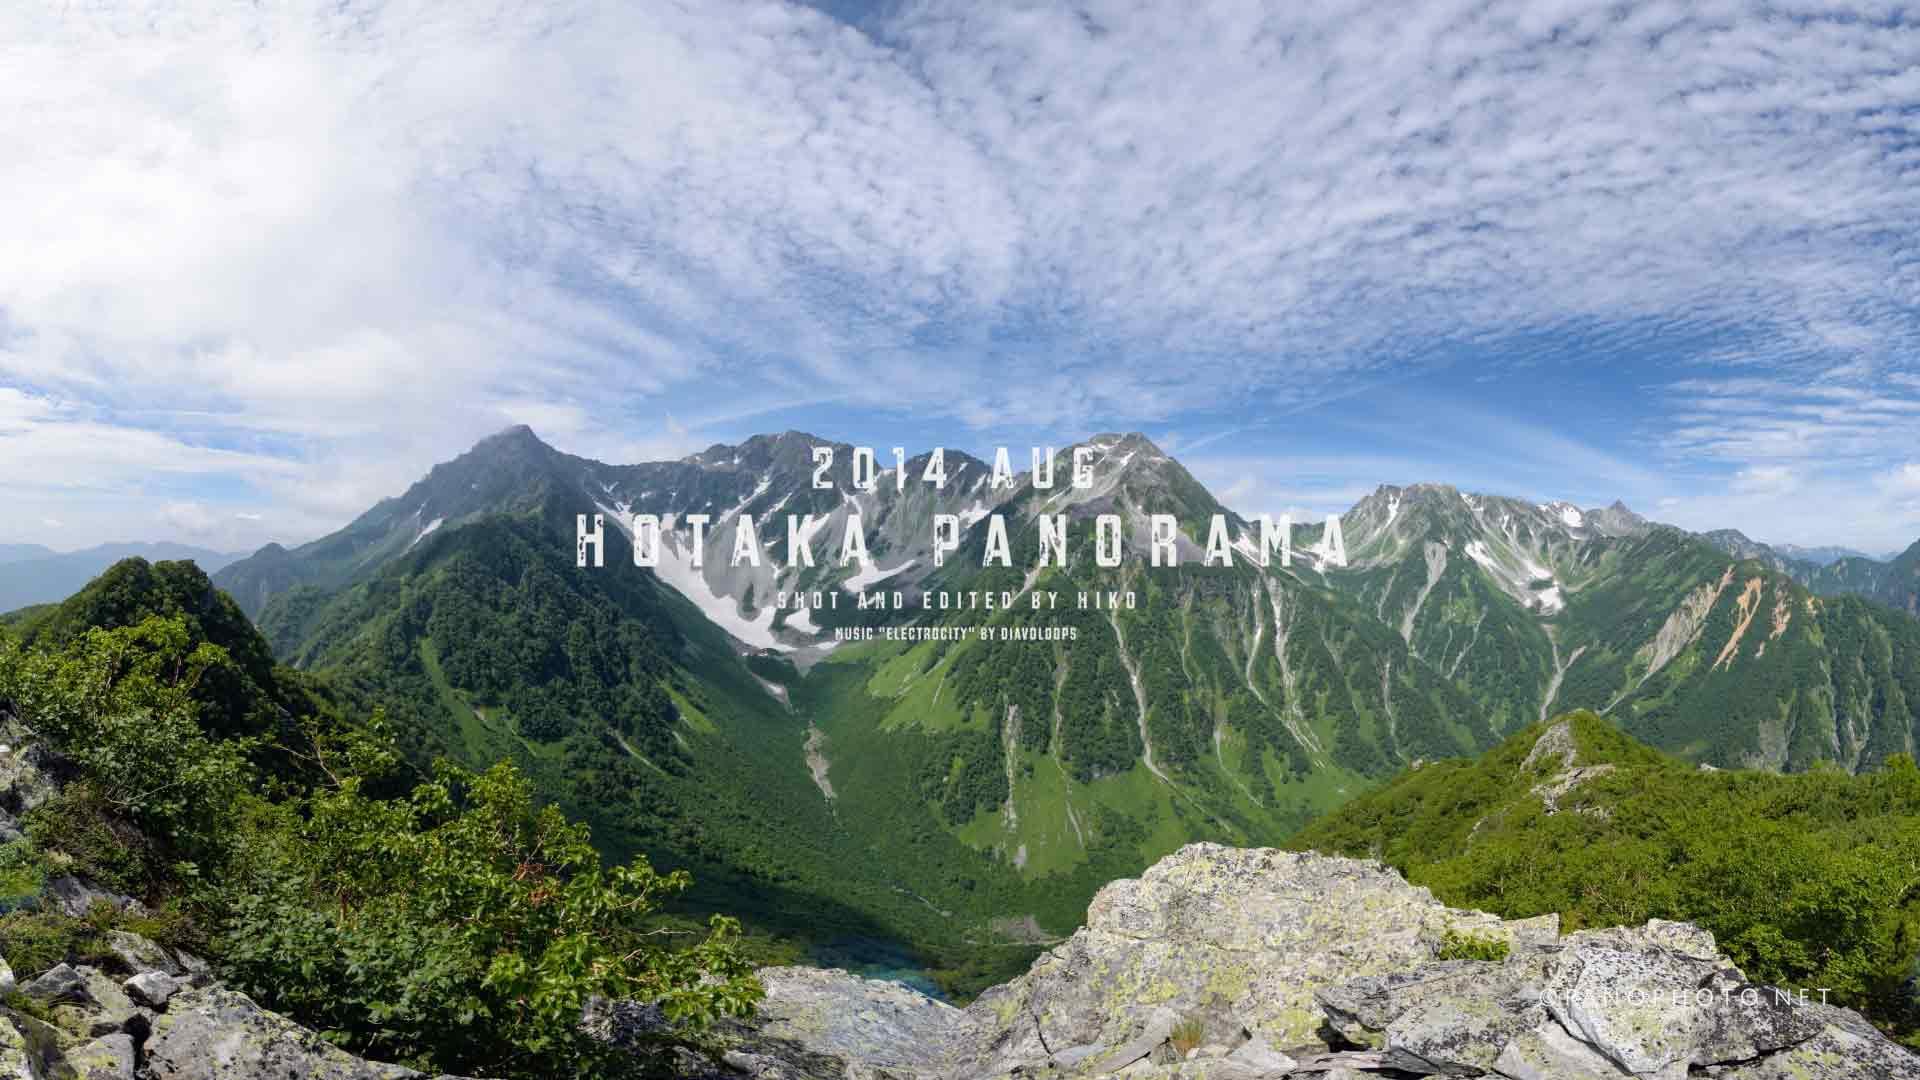 Hotaka-Panorama-Featured-Image